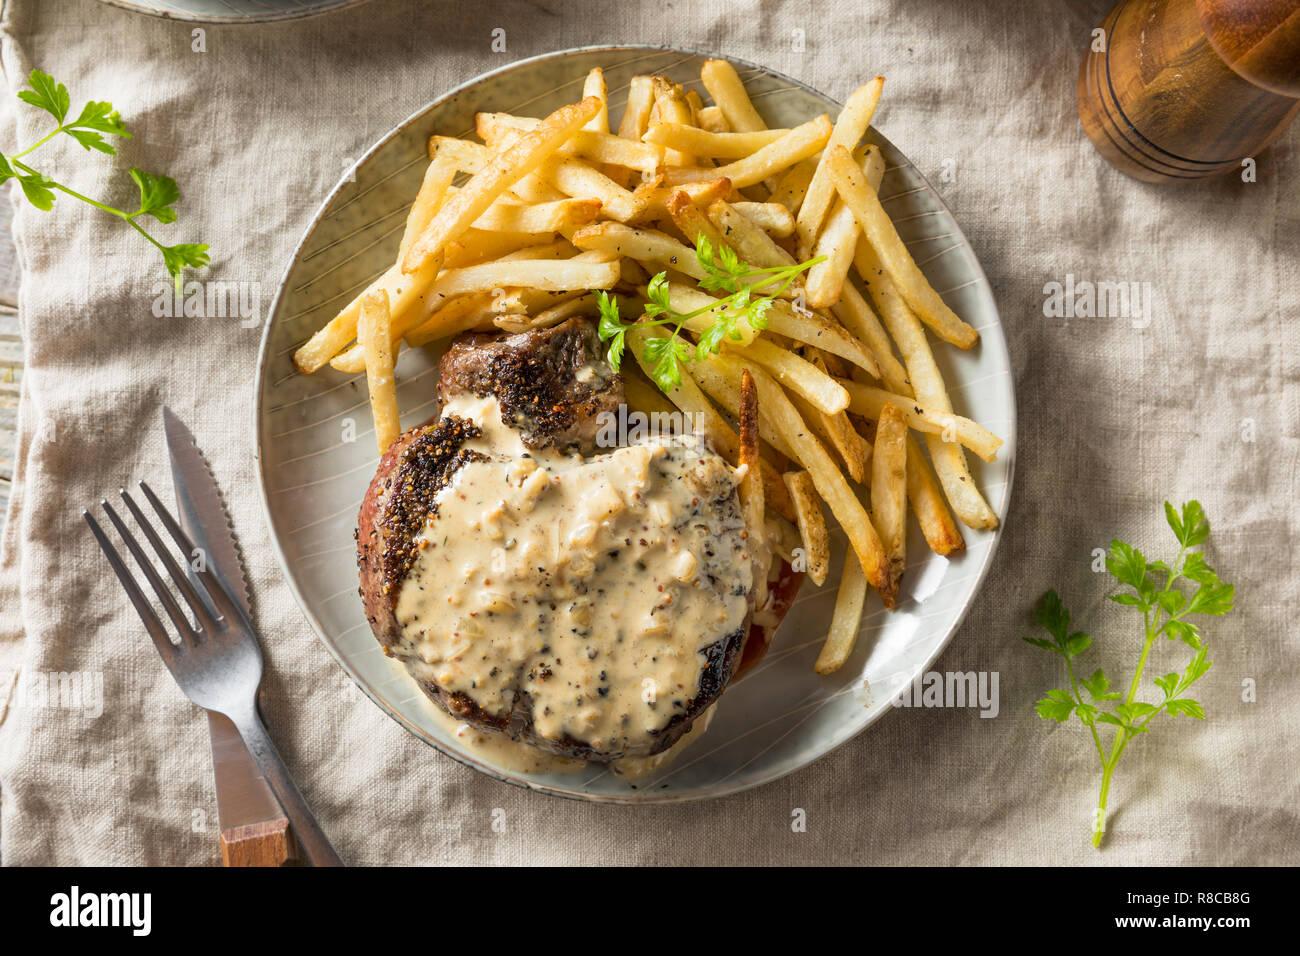 Homemade Steak Au Poivre with Pepper Sauce Stock Photo